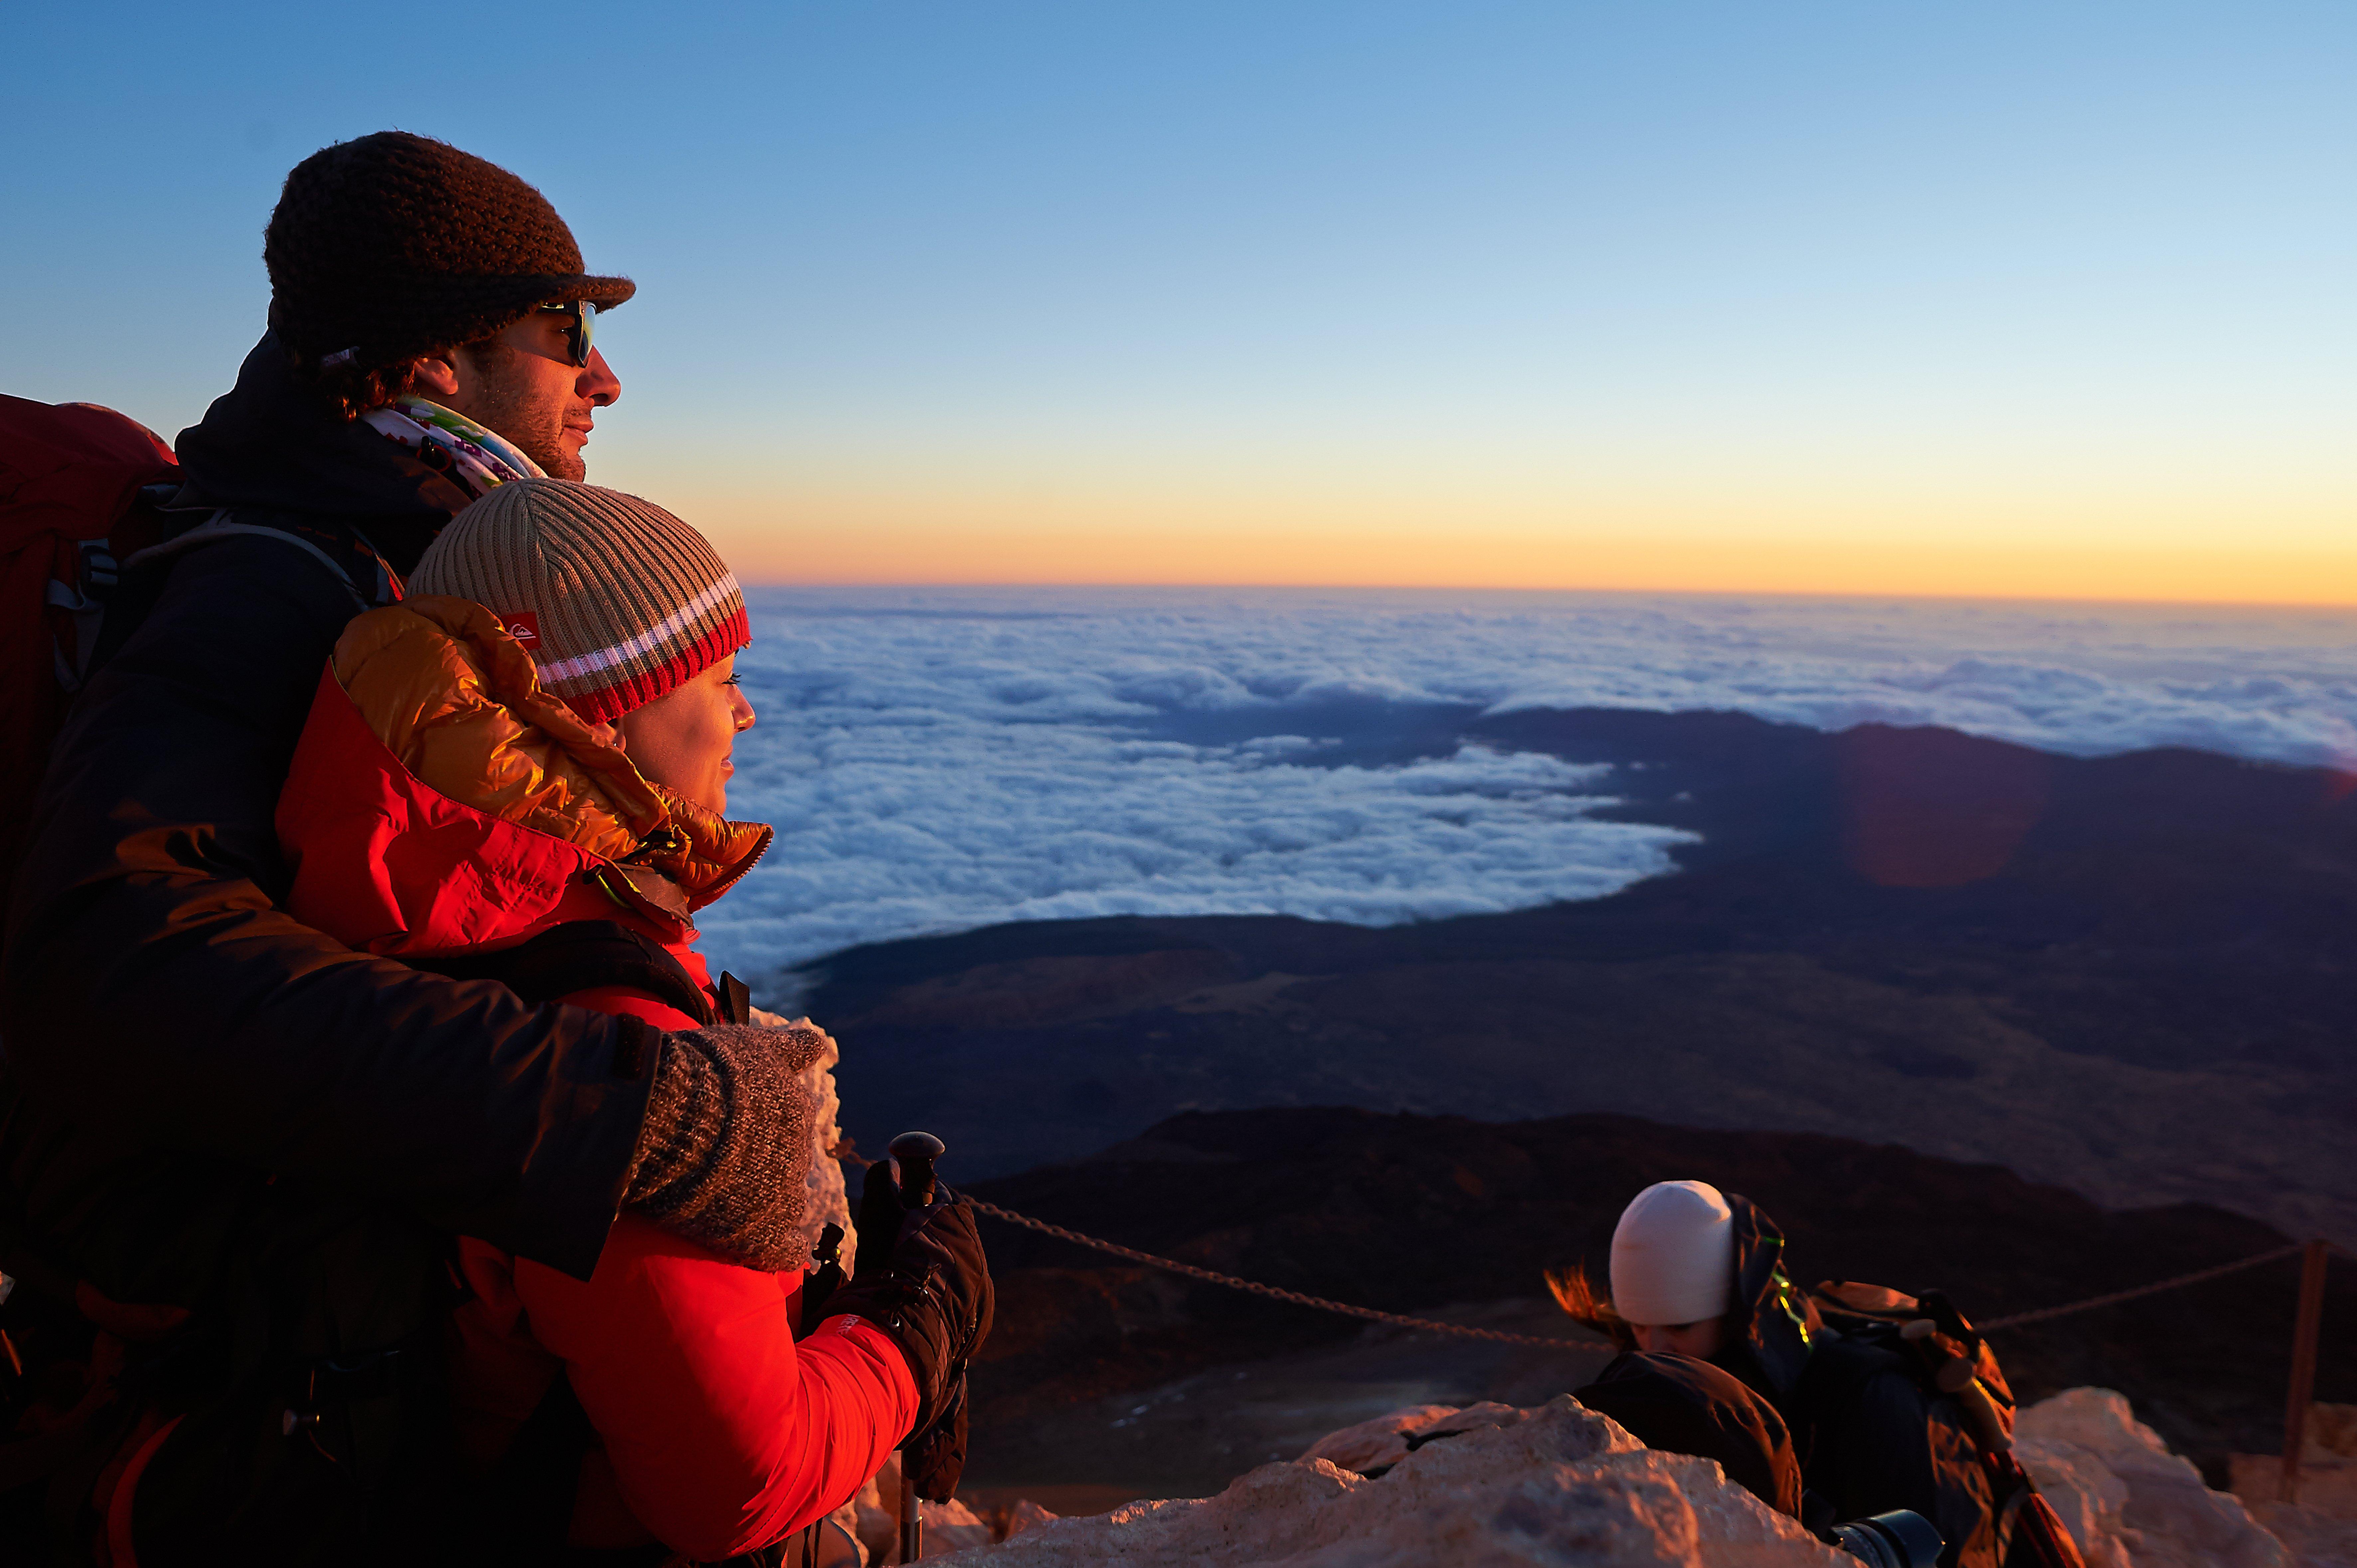 Ascending the Peak of Teide on foot